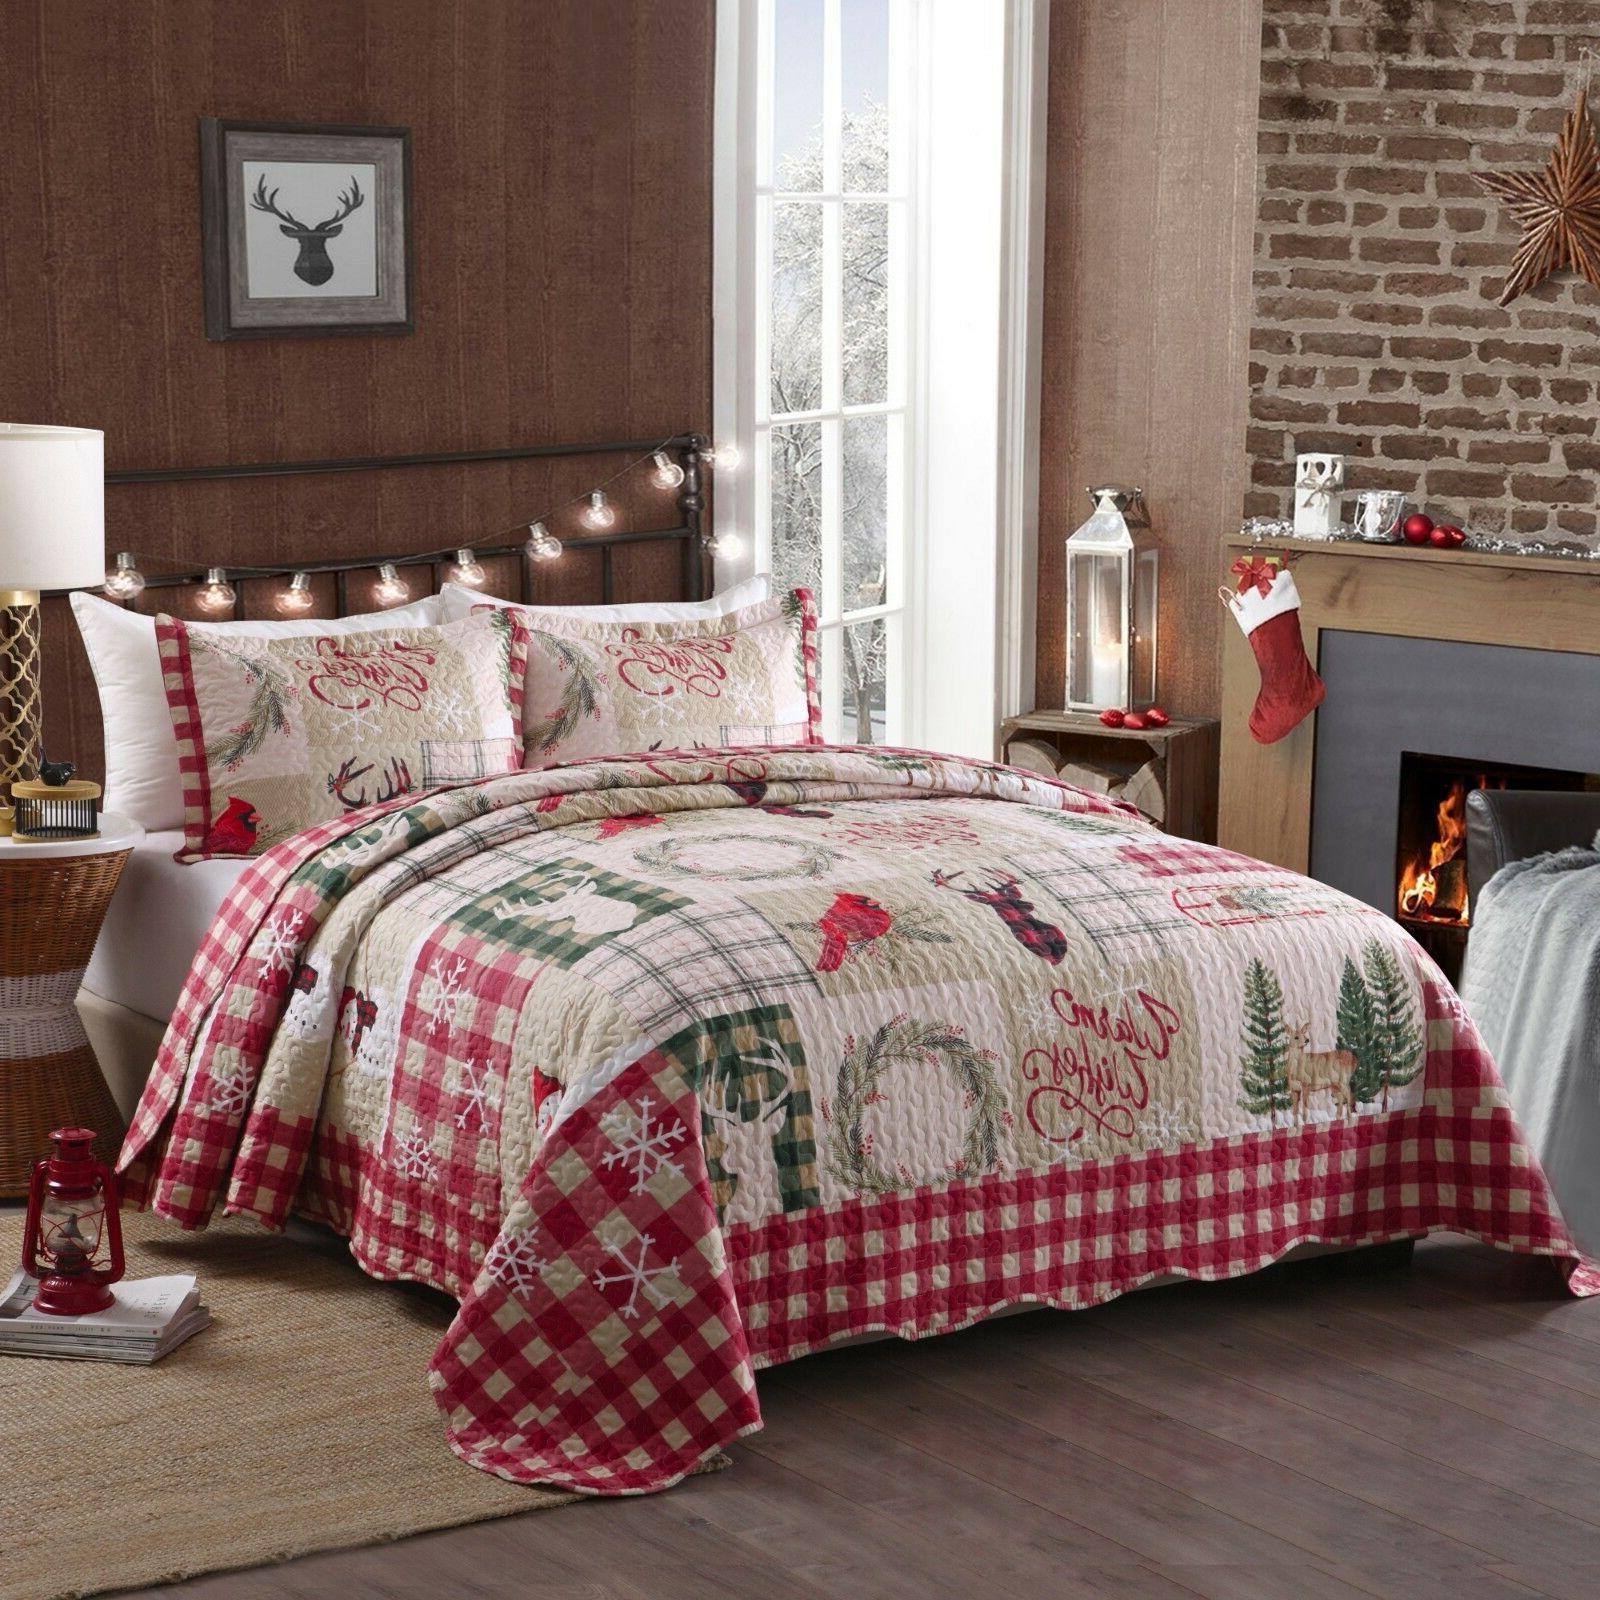 3 Piece Christmas Rustic Western Lodge Bedspread Man